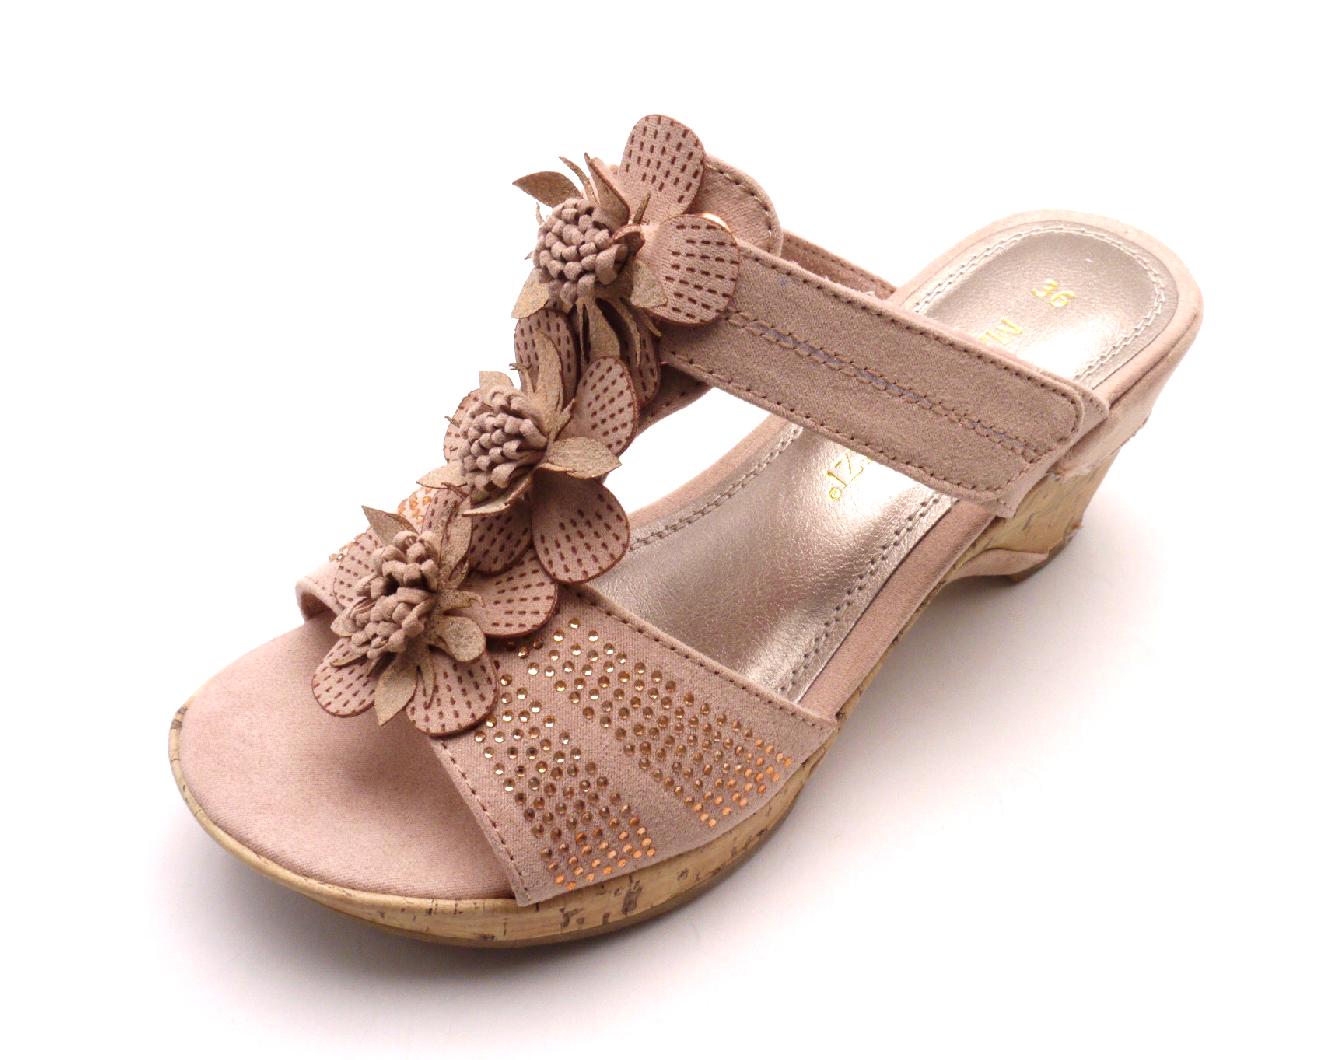 Marco Tozzi Dámské pantofle 27213-28 ROSE Velikost: 36